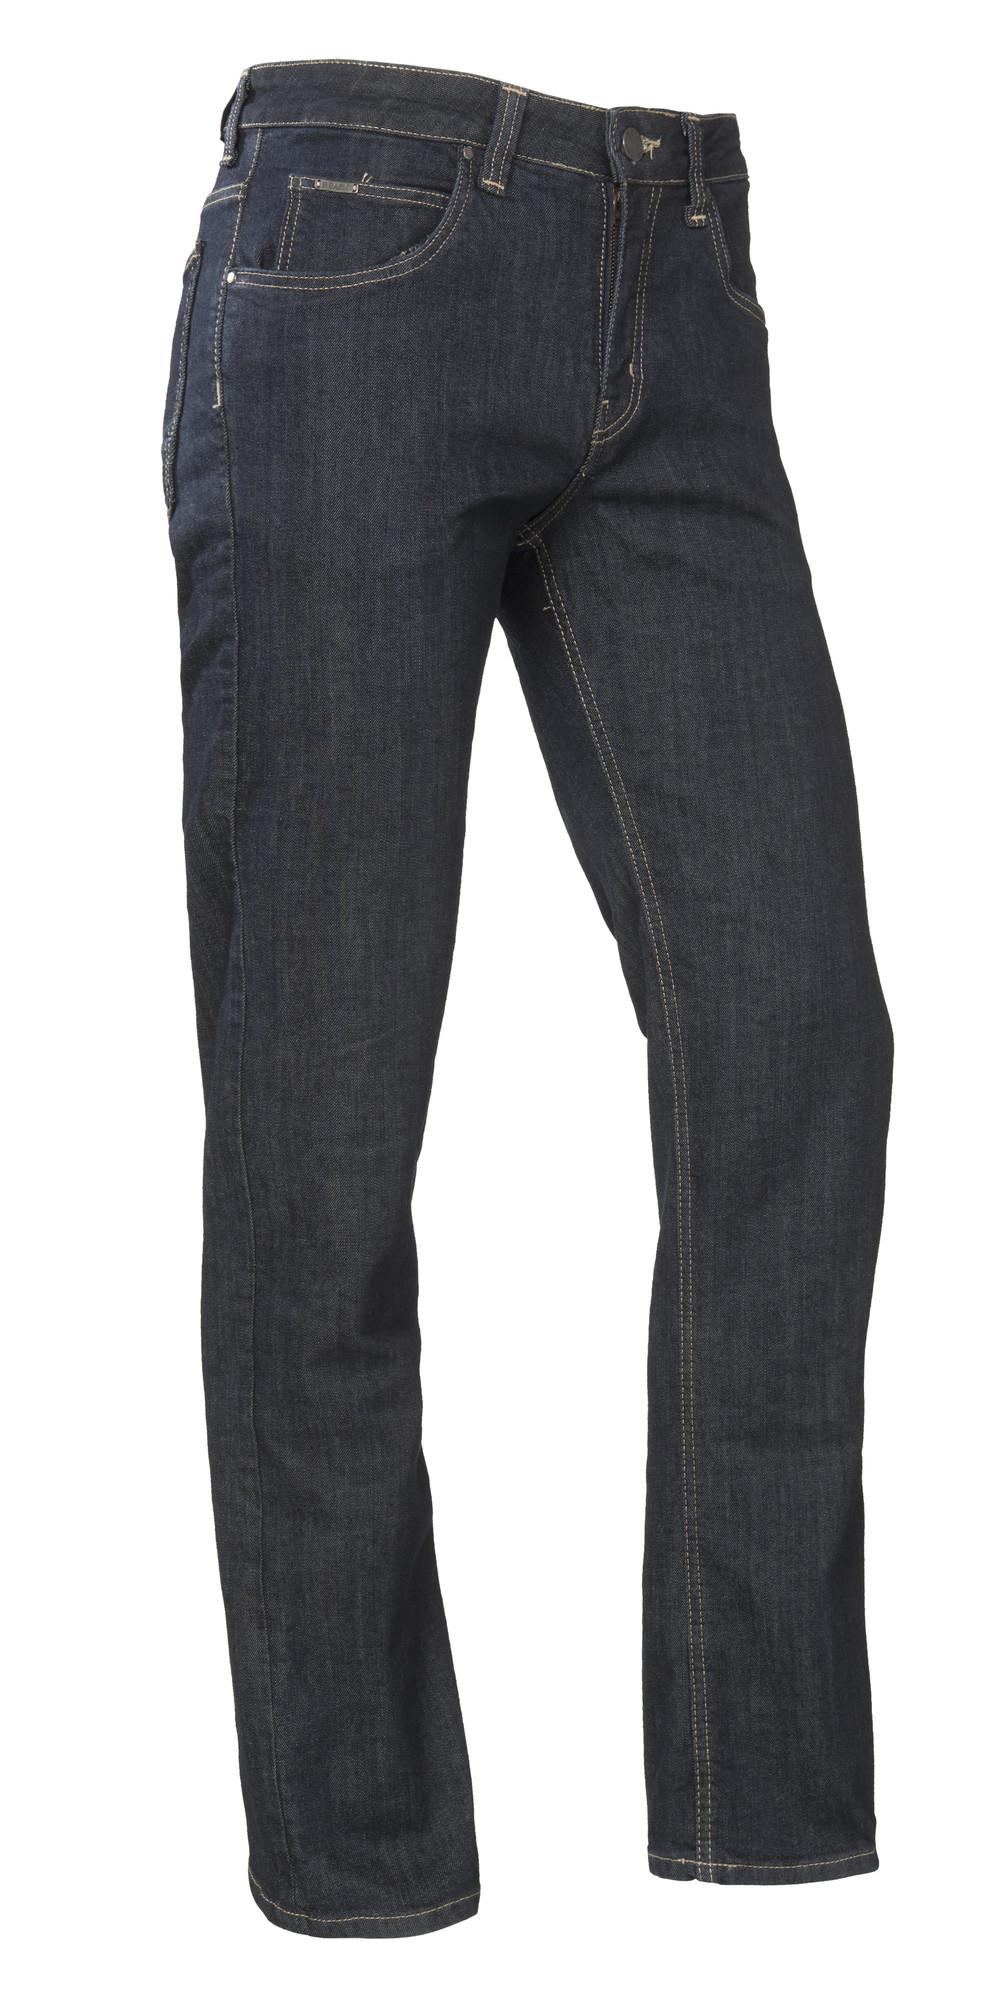 Brams Paris Danny Jeans Stretch (C94 BlueBLackDenim) W33-L36